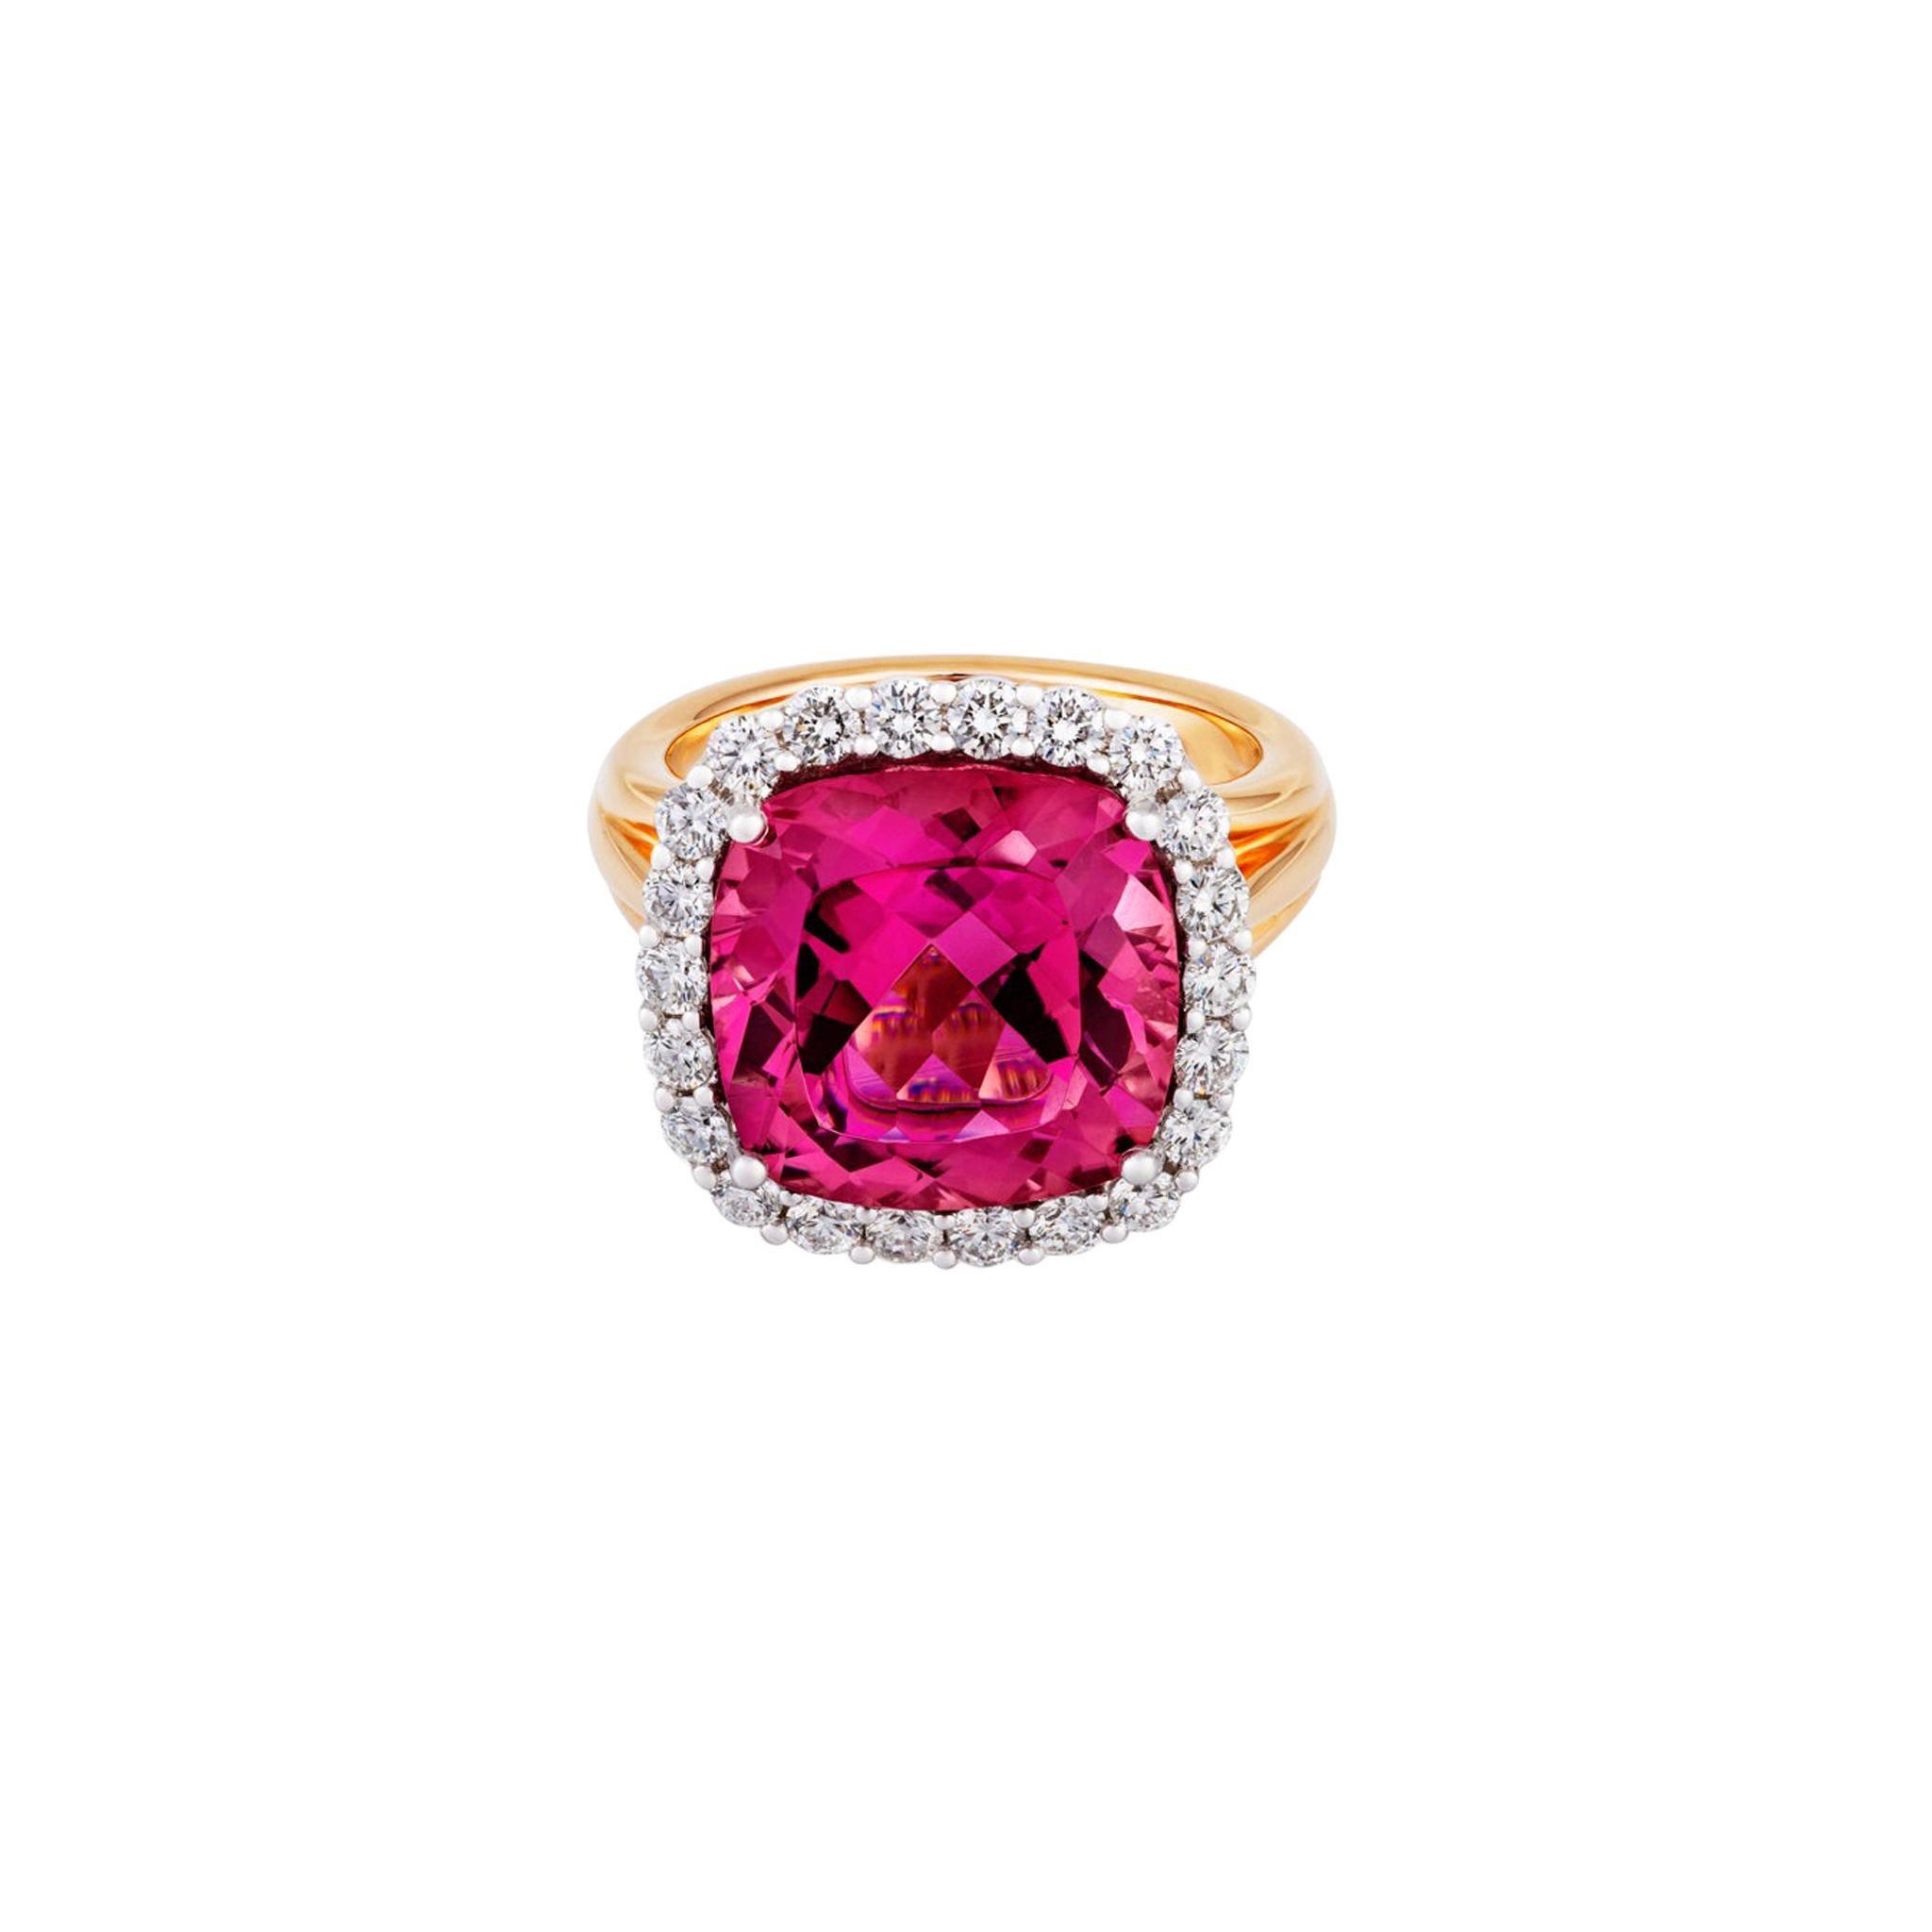 8.3ct Cushion Cut Pink Tourmaline .84ct Diamond 14kt Yellow Gold Ring